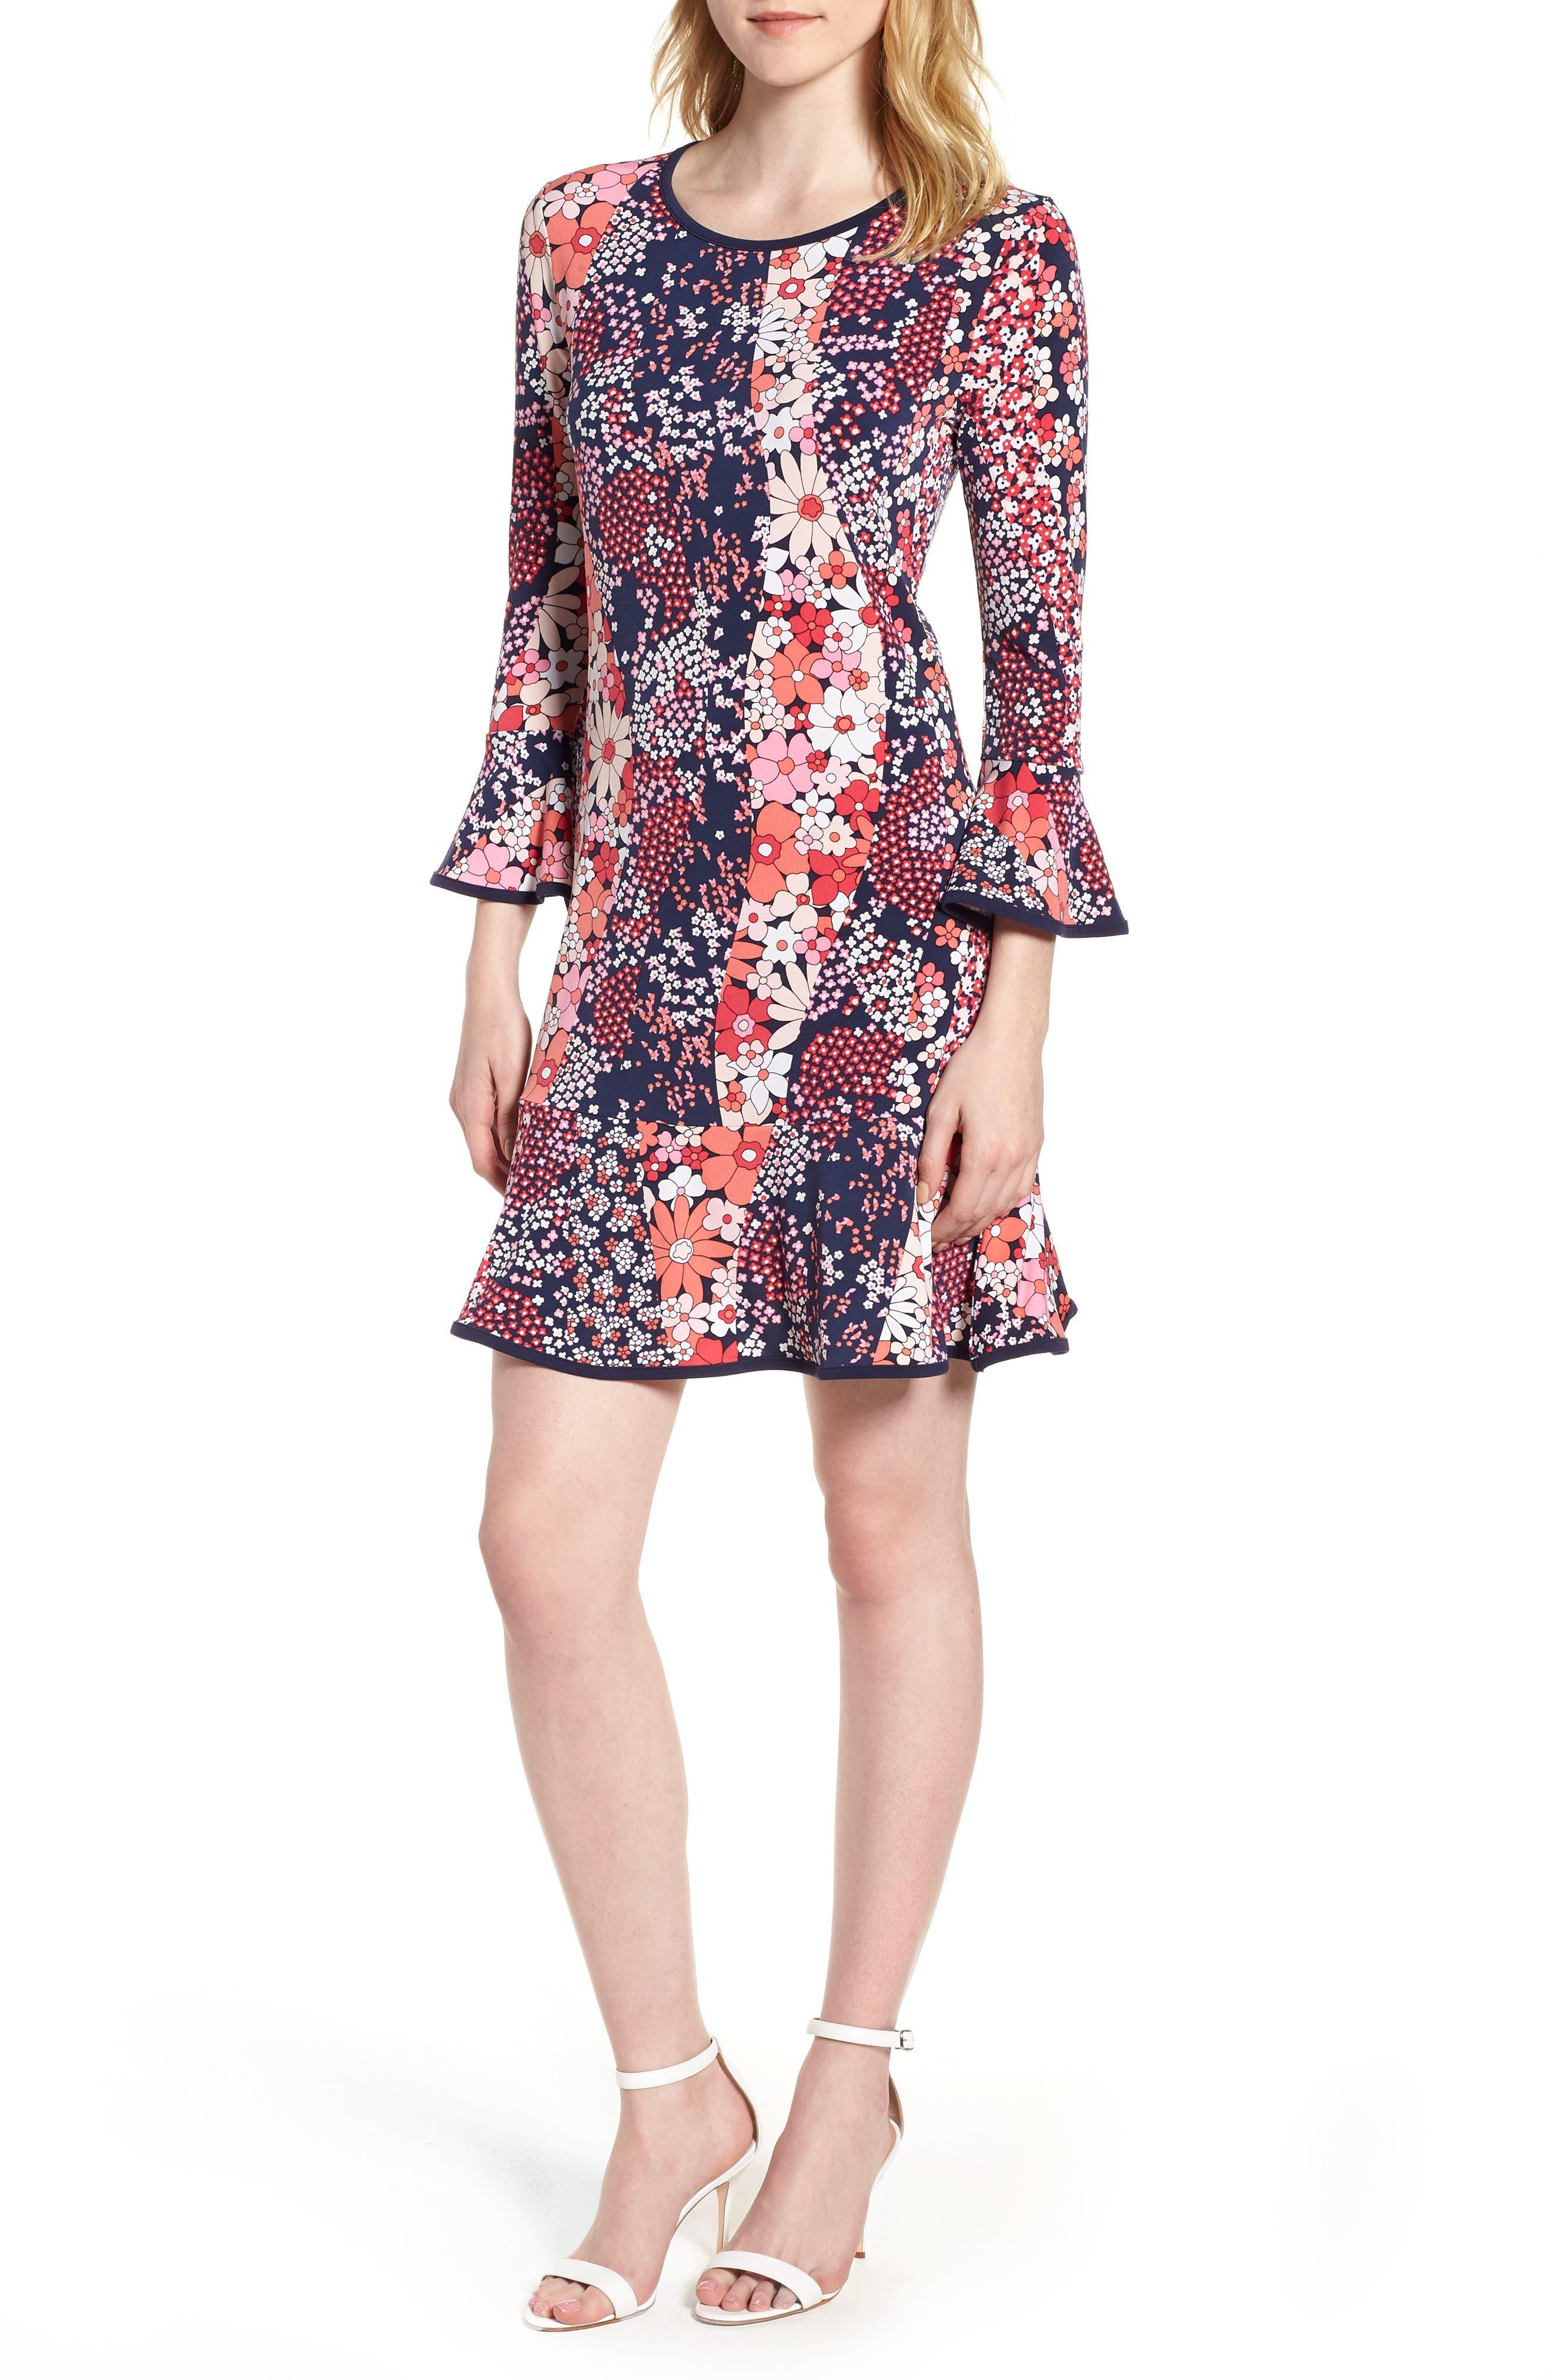 Patch Flower Flounce Dress,                         Main,                         color, True Navy/ Bright Blush